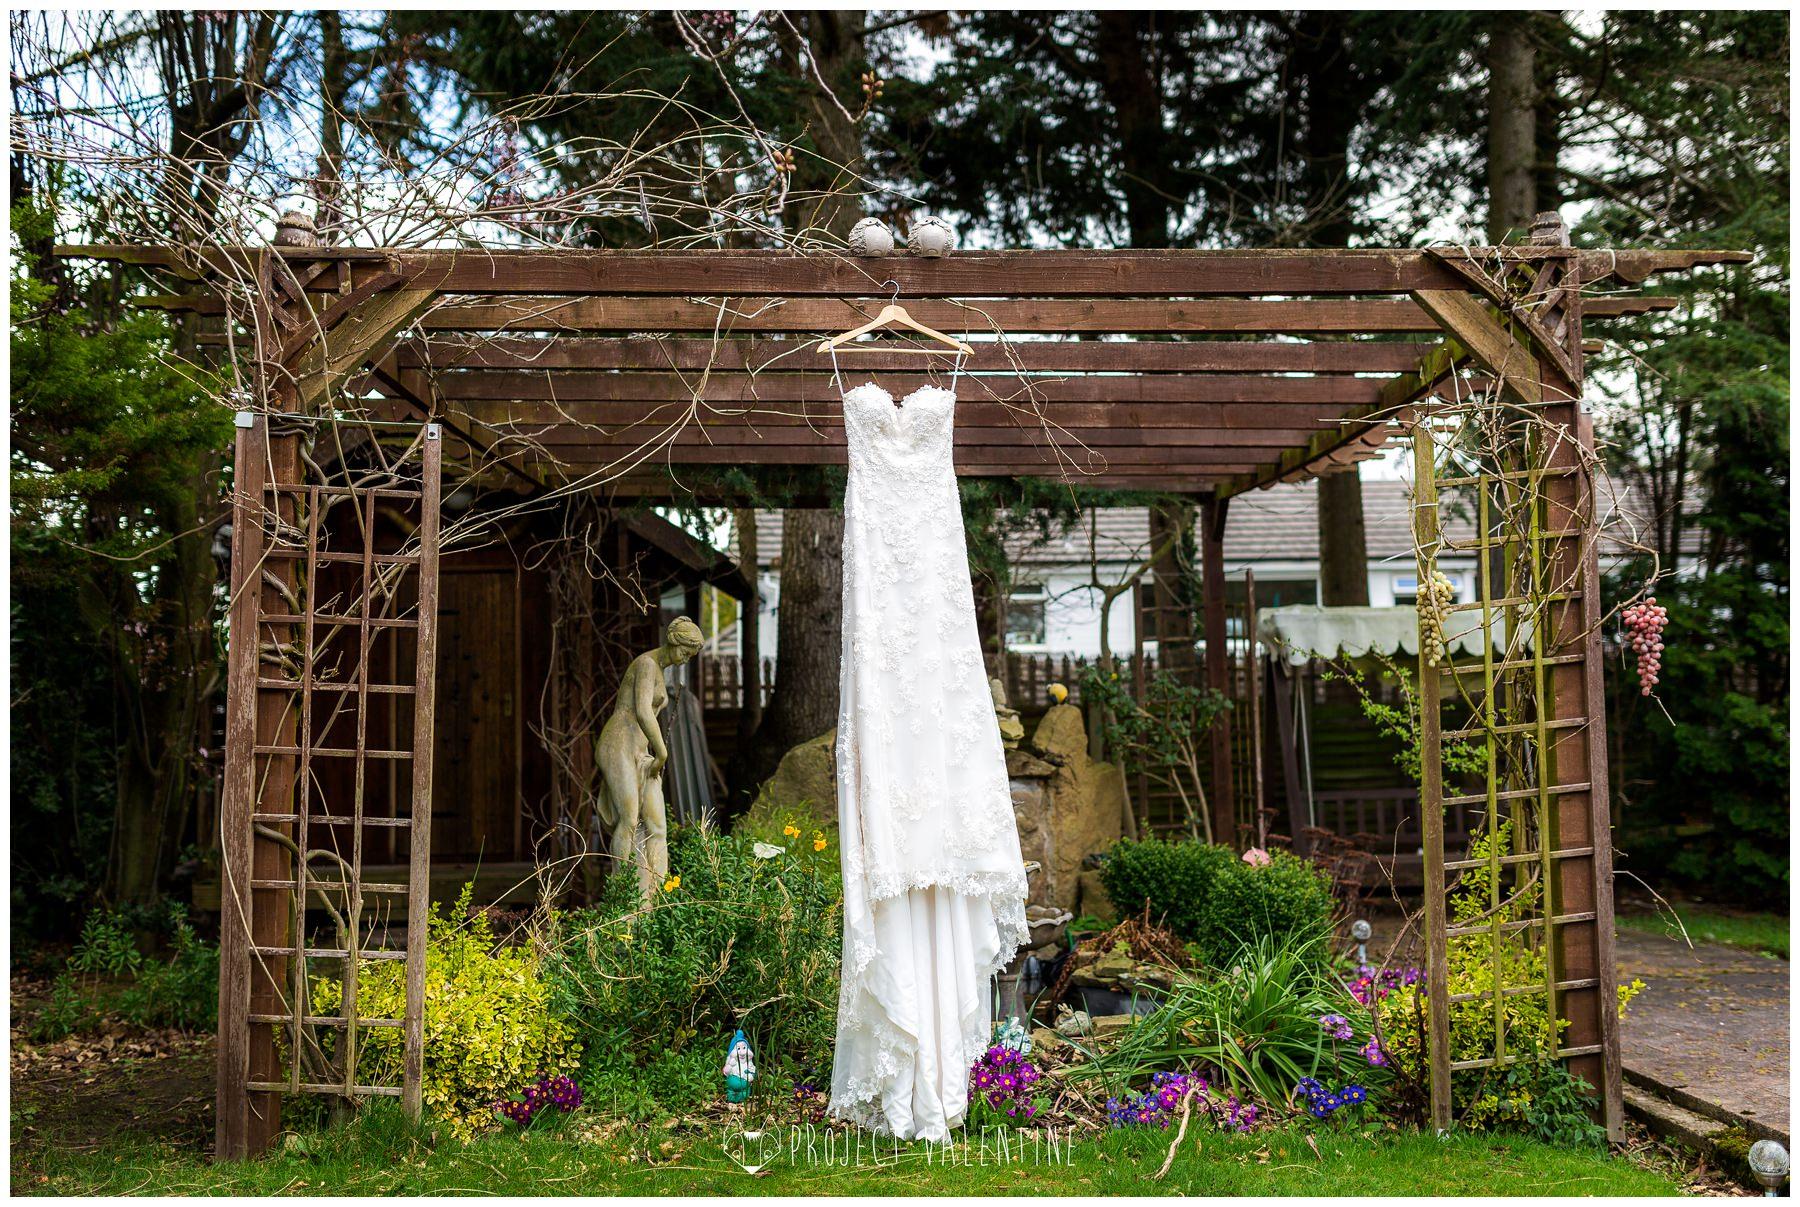 the wedding dress hung outside